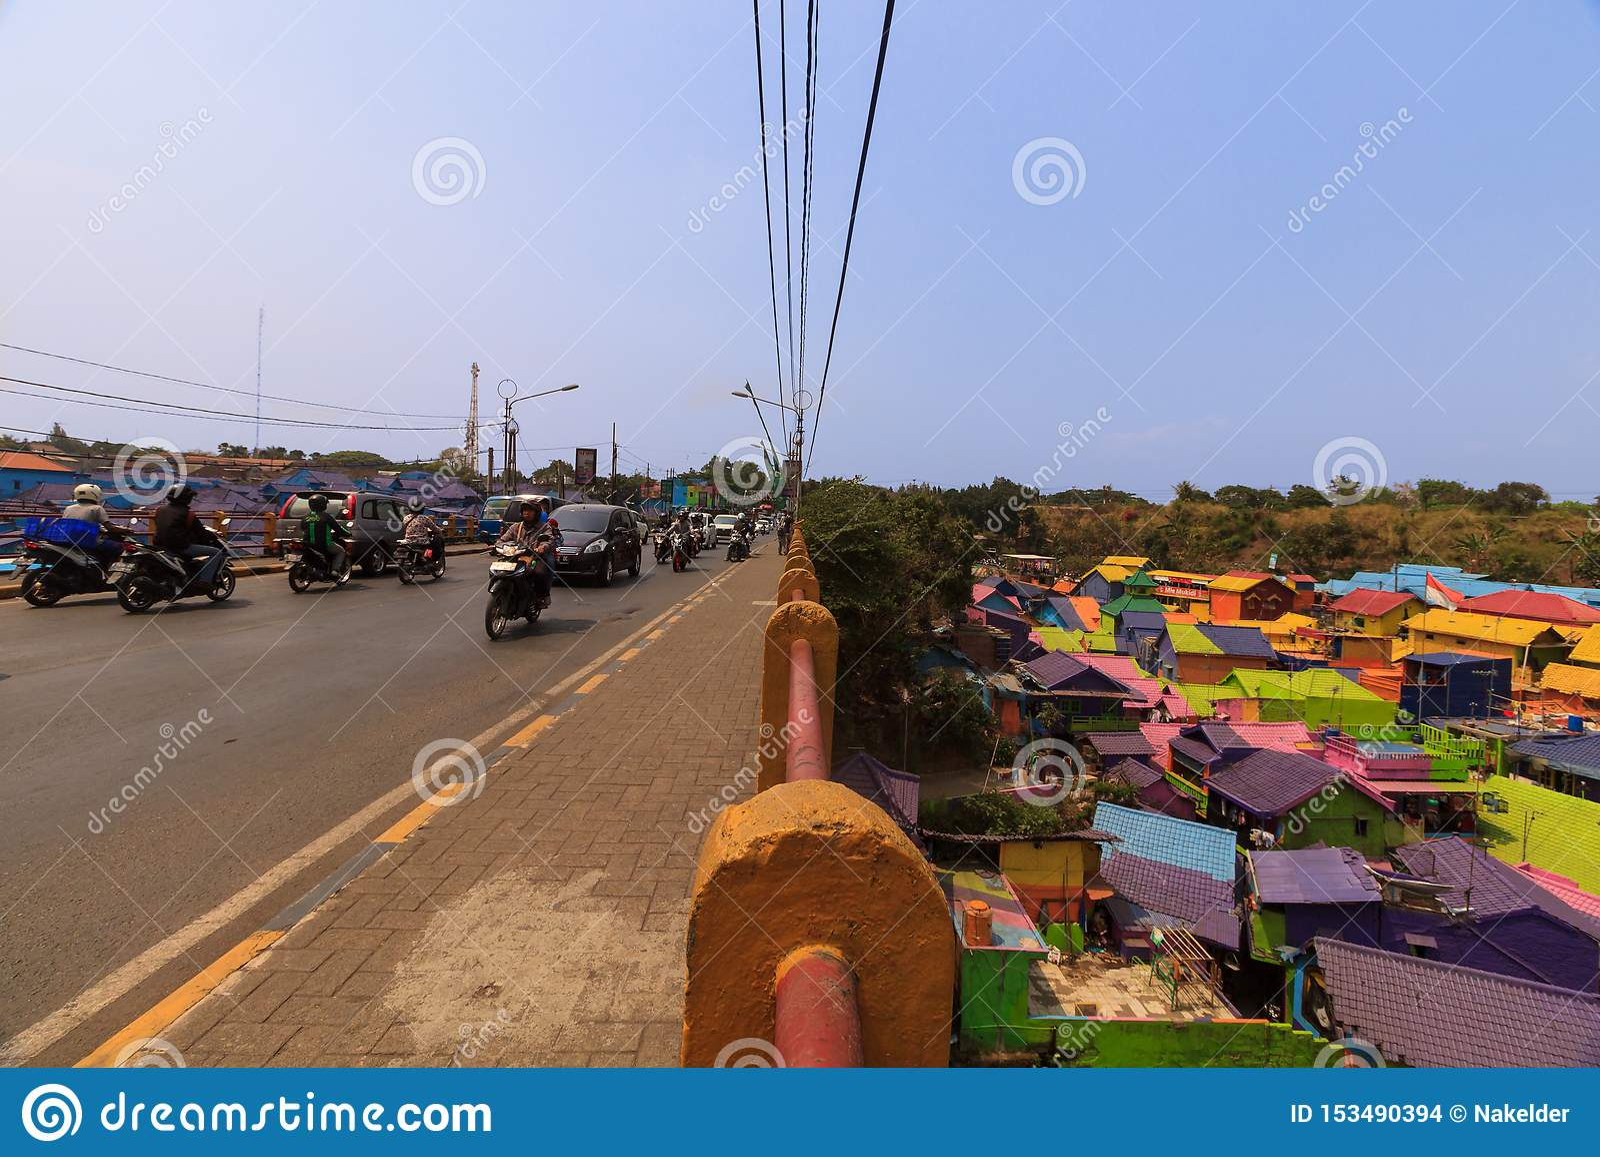 Kampung Warna Warni Jodipan Colourful wioska Malang